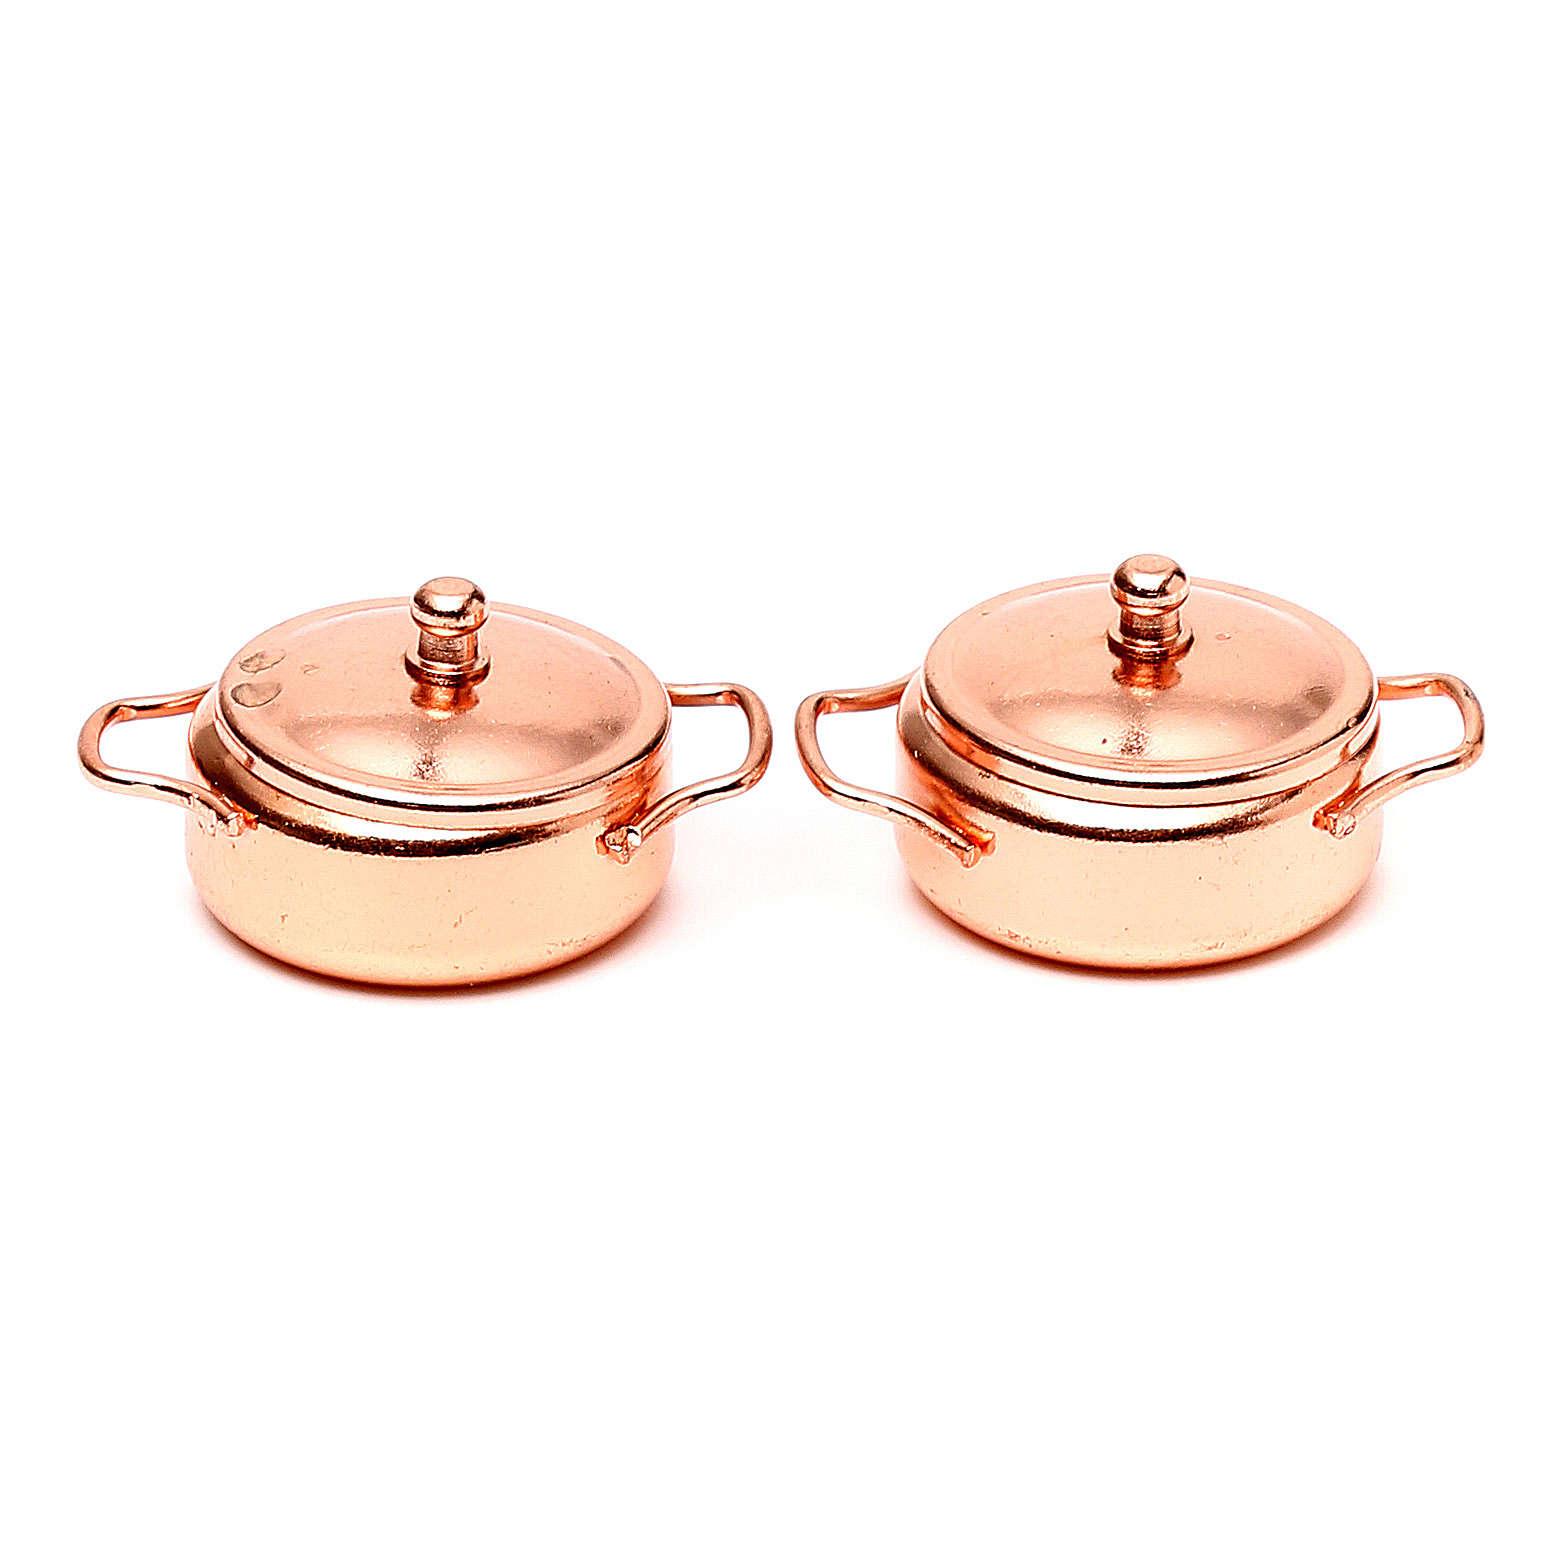 Pans in copper coloured metal, nativity set, 2pcs 4